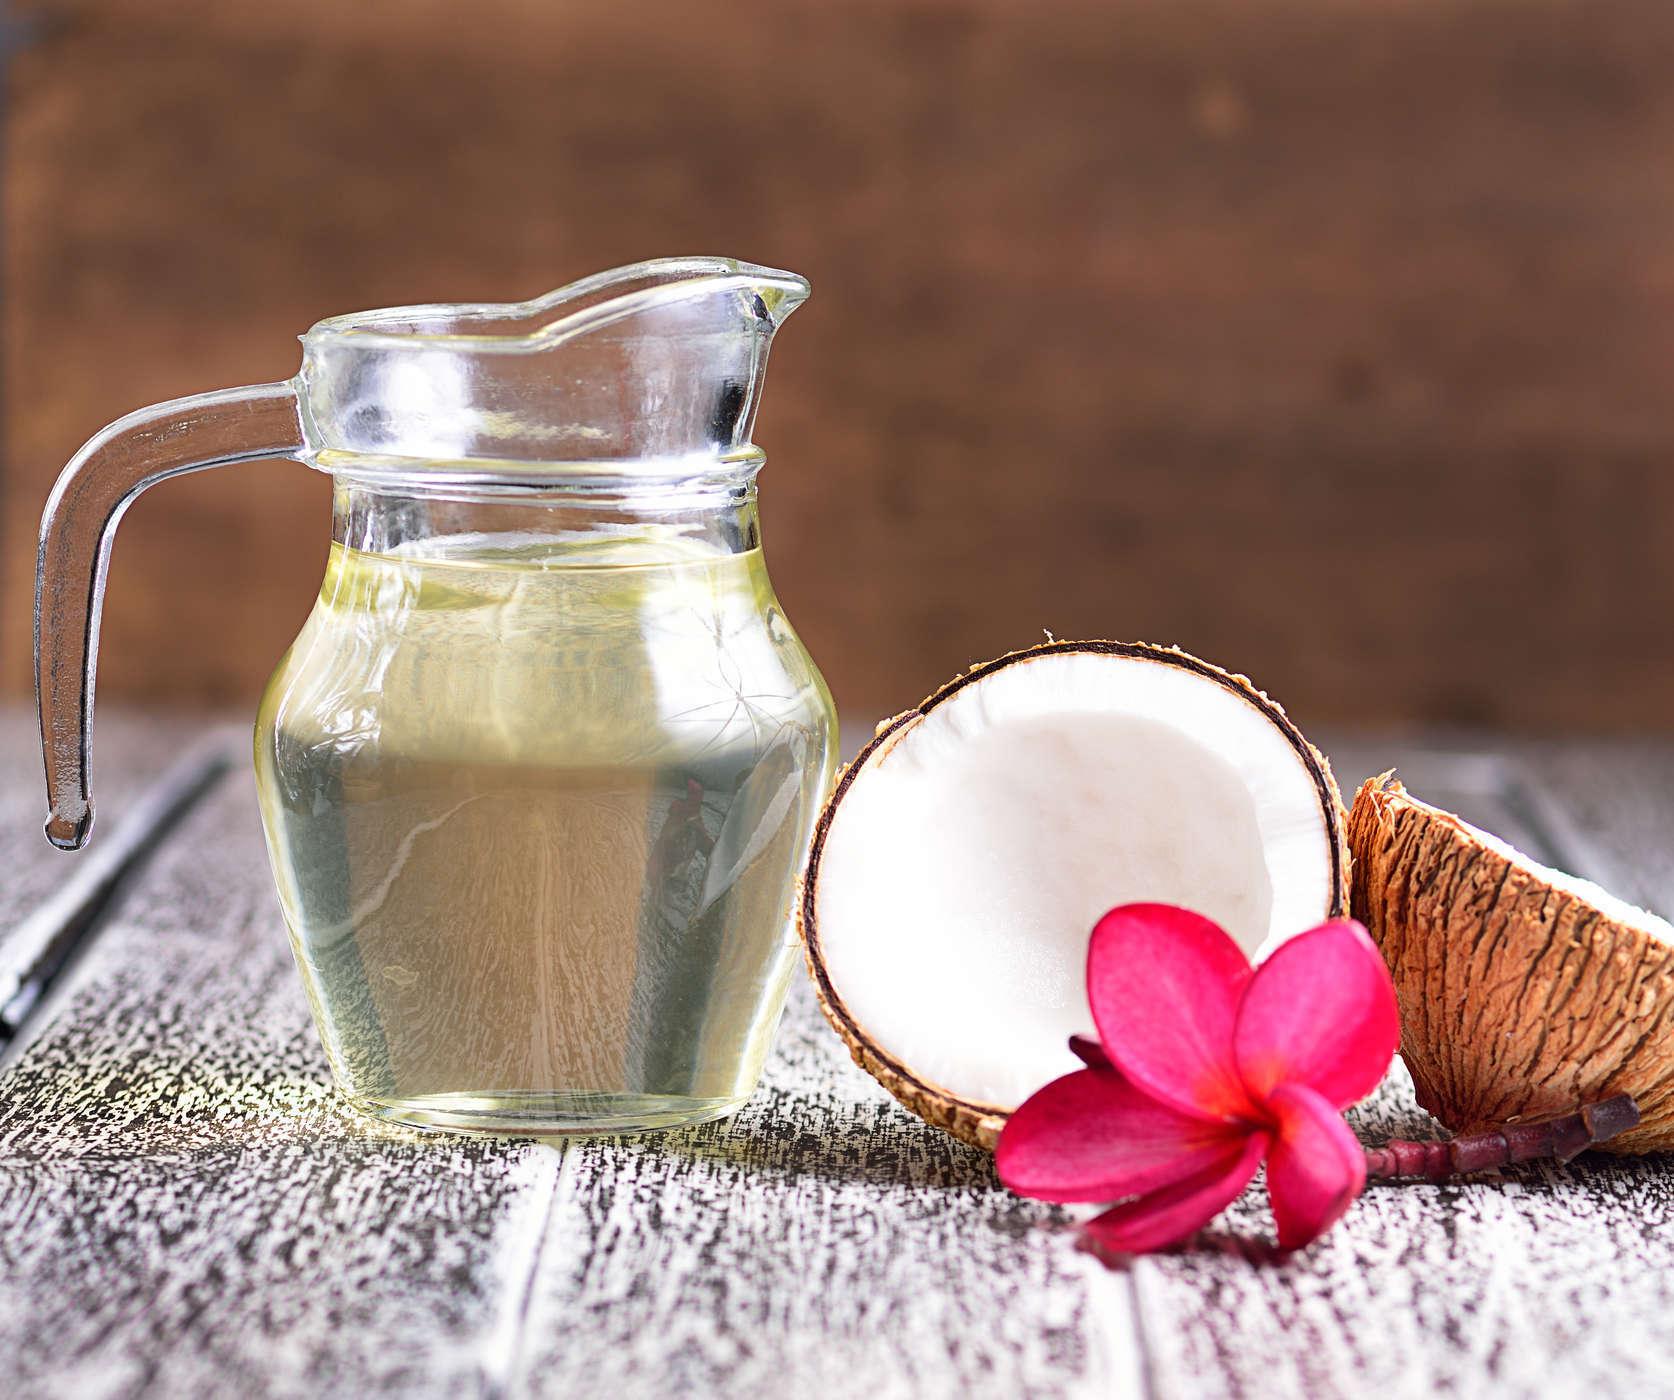 trị hăm tã bằng dầu dừa